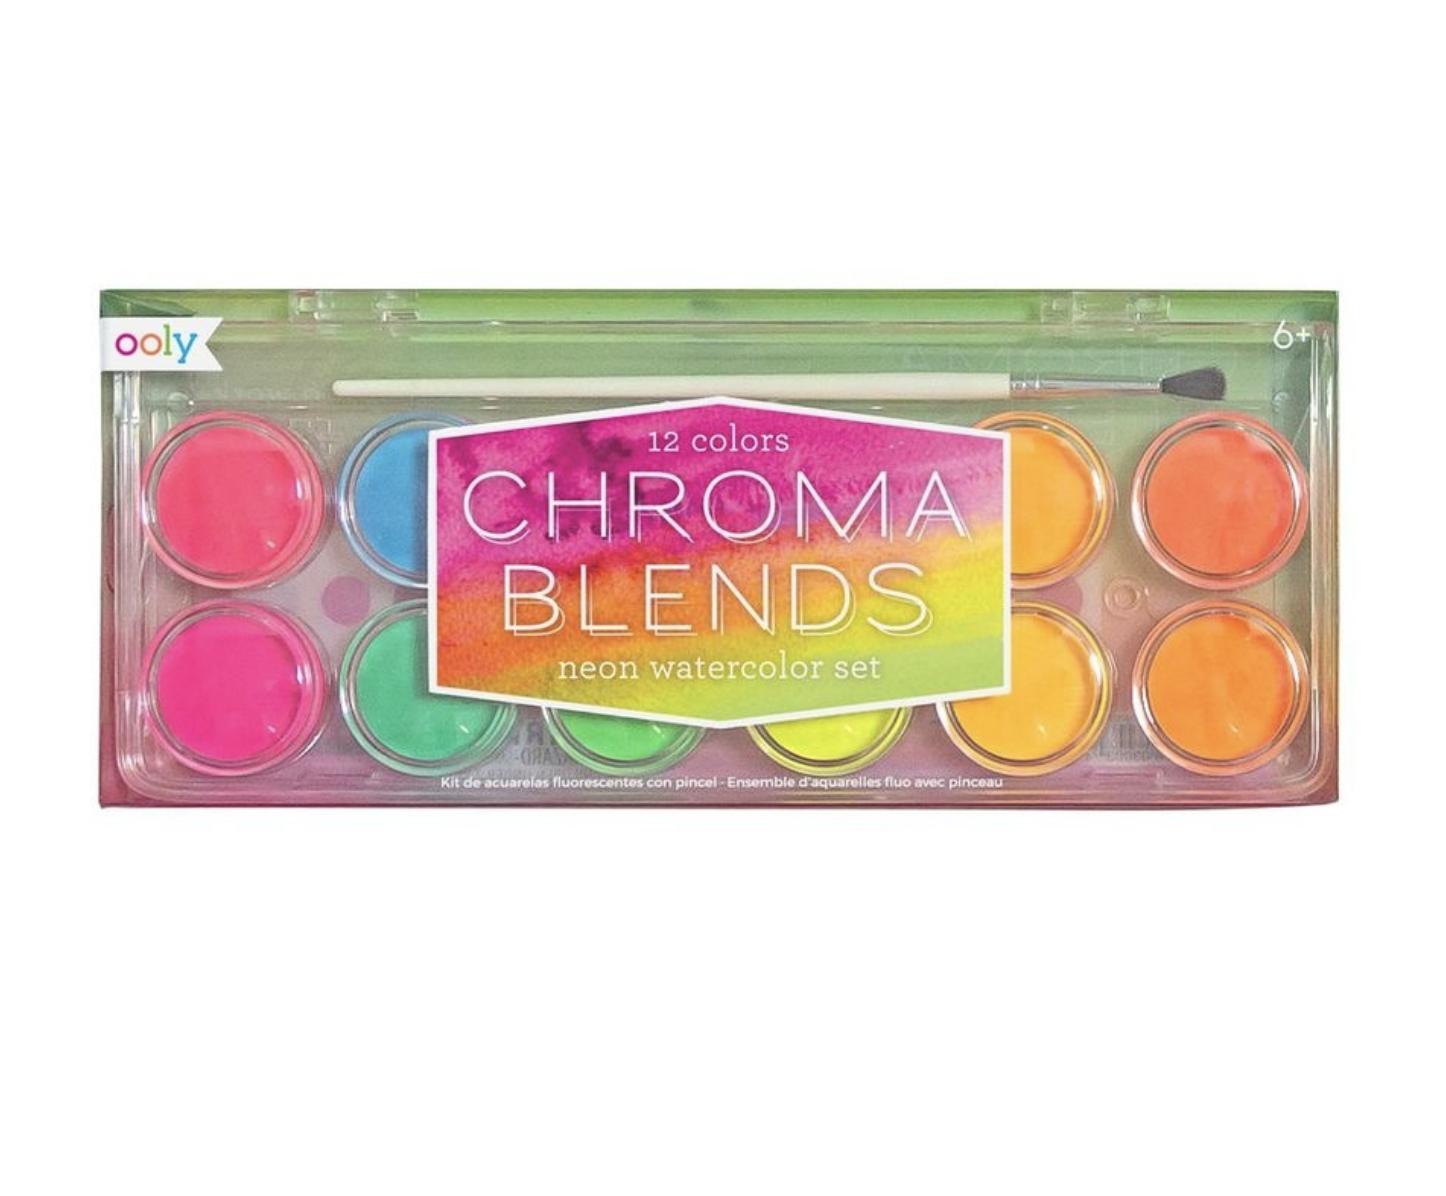 Chroma Neon Watercolor Paint